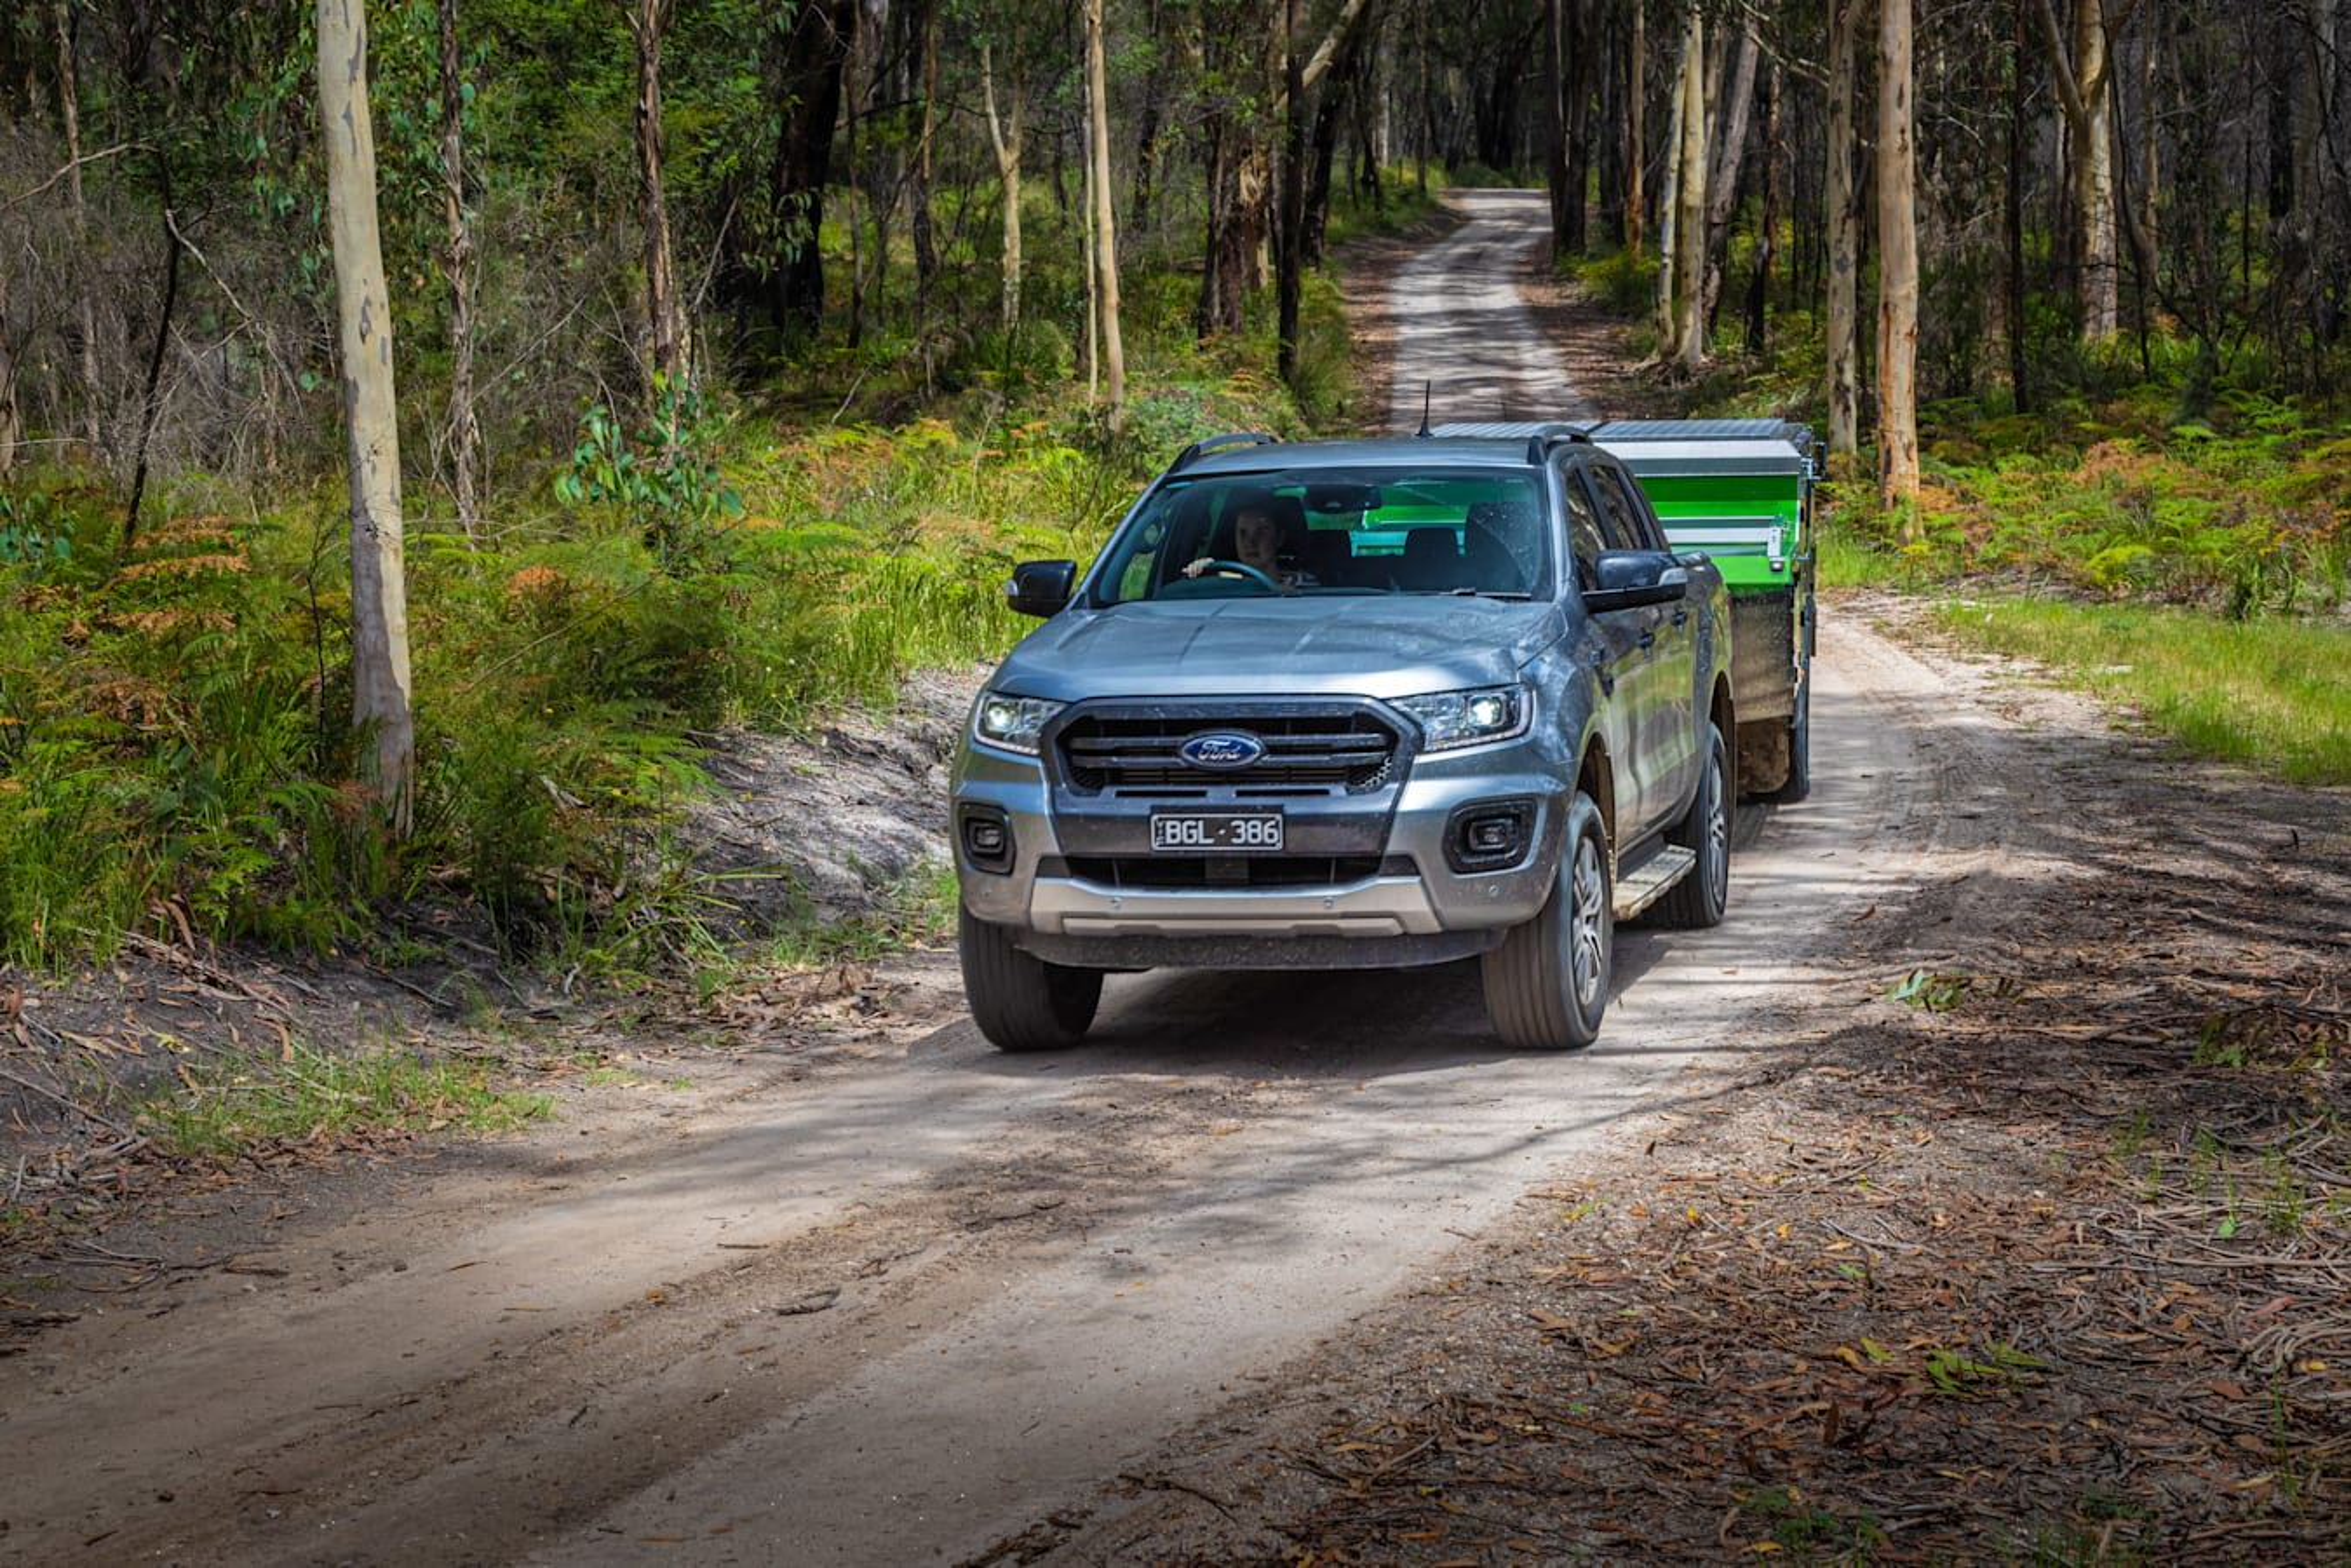 4 X 4 Australia Reviews 2021 June 2021 2021 Ford Ranger Wildtrak 1